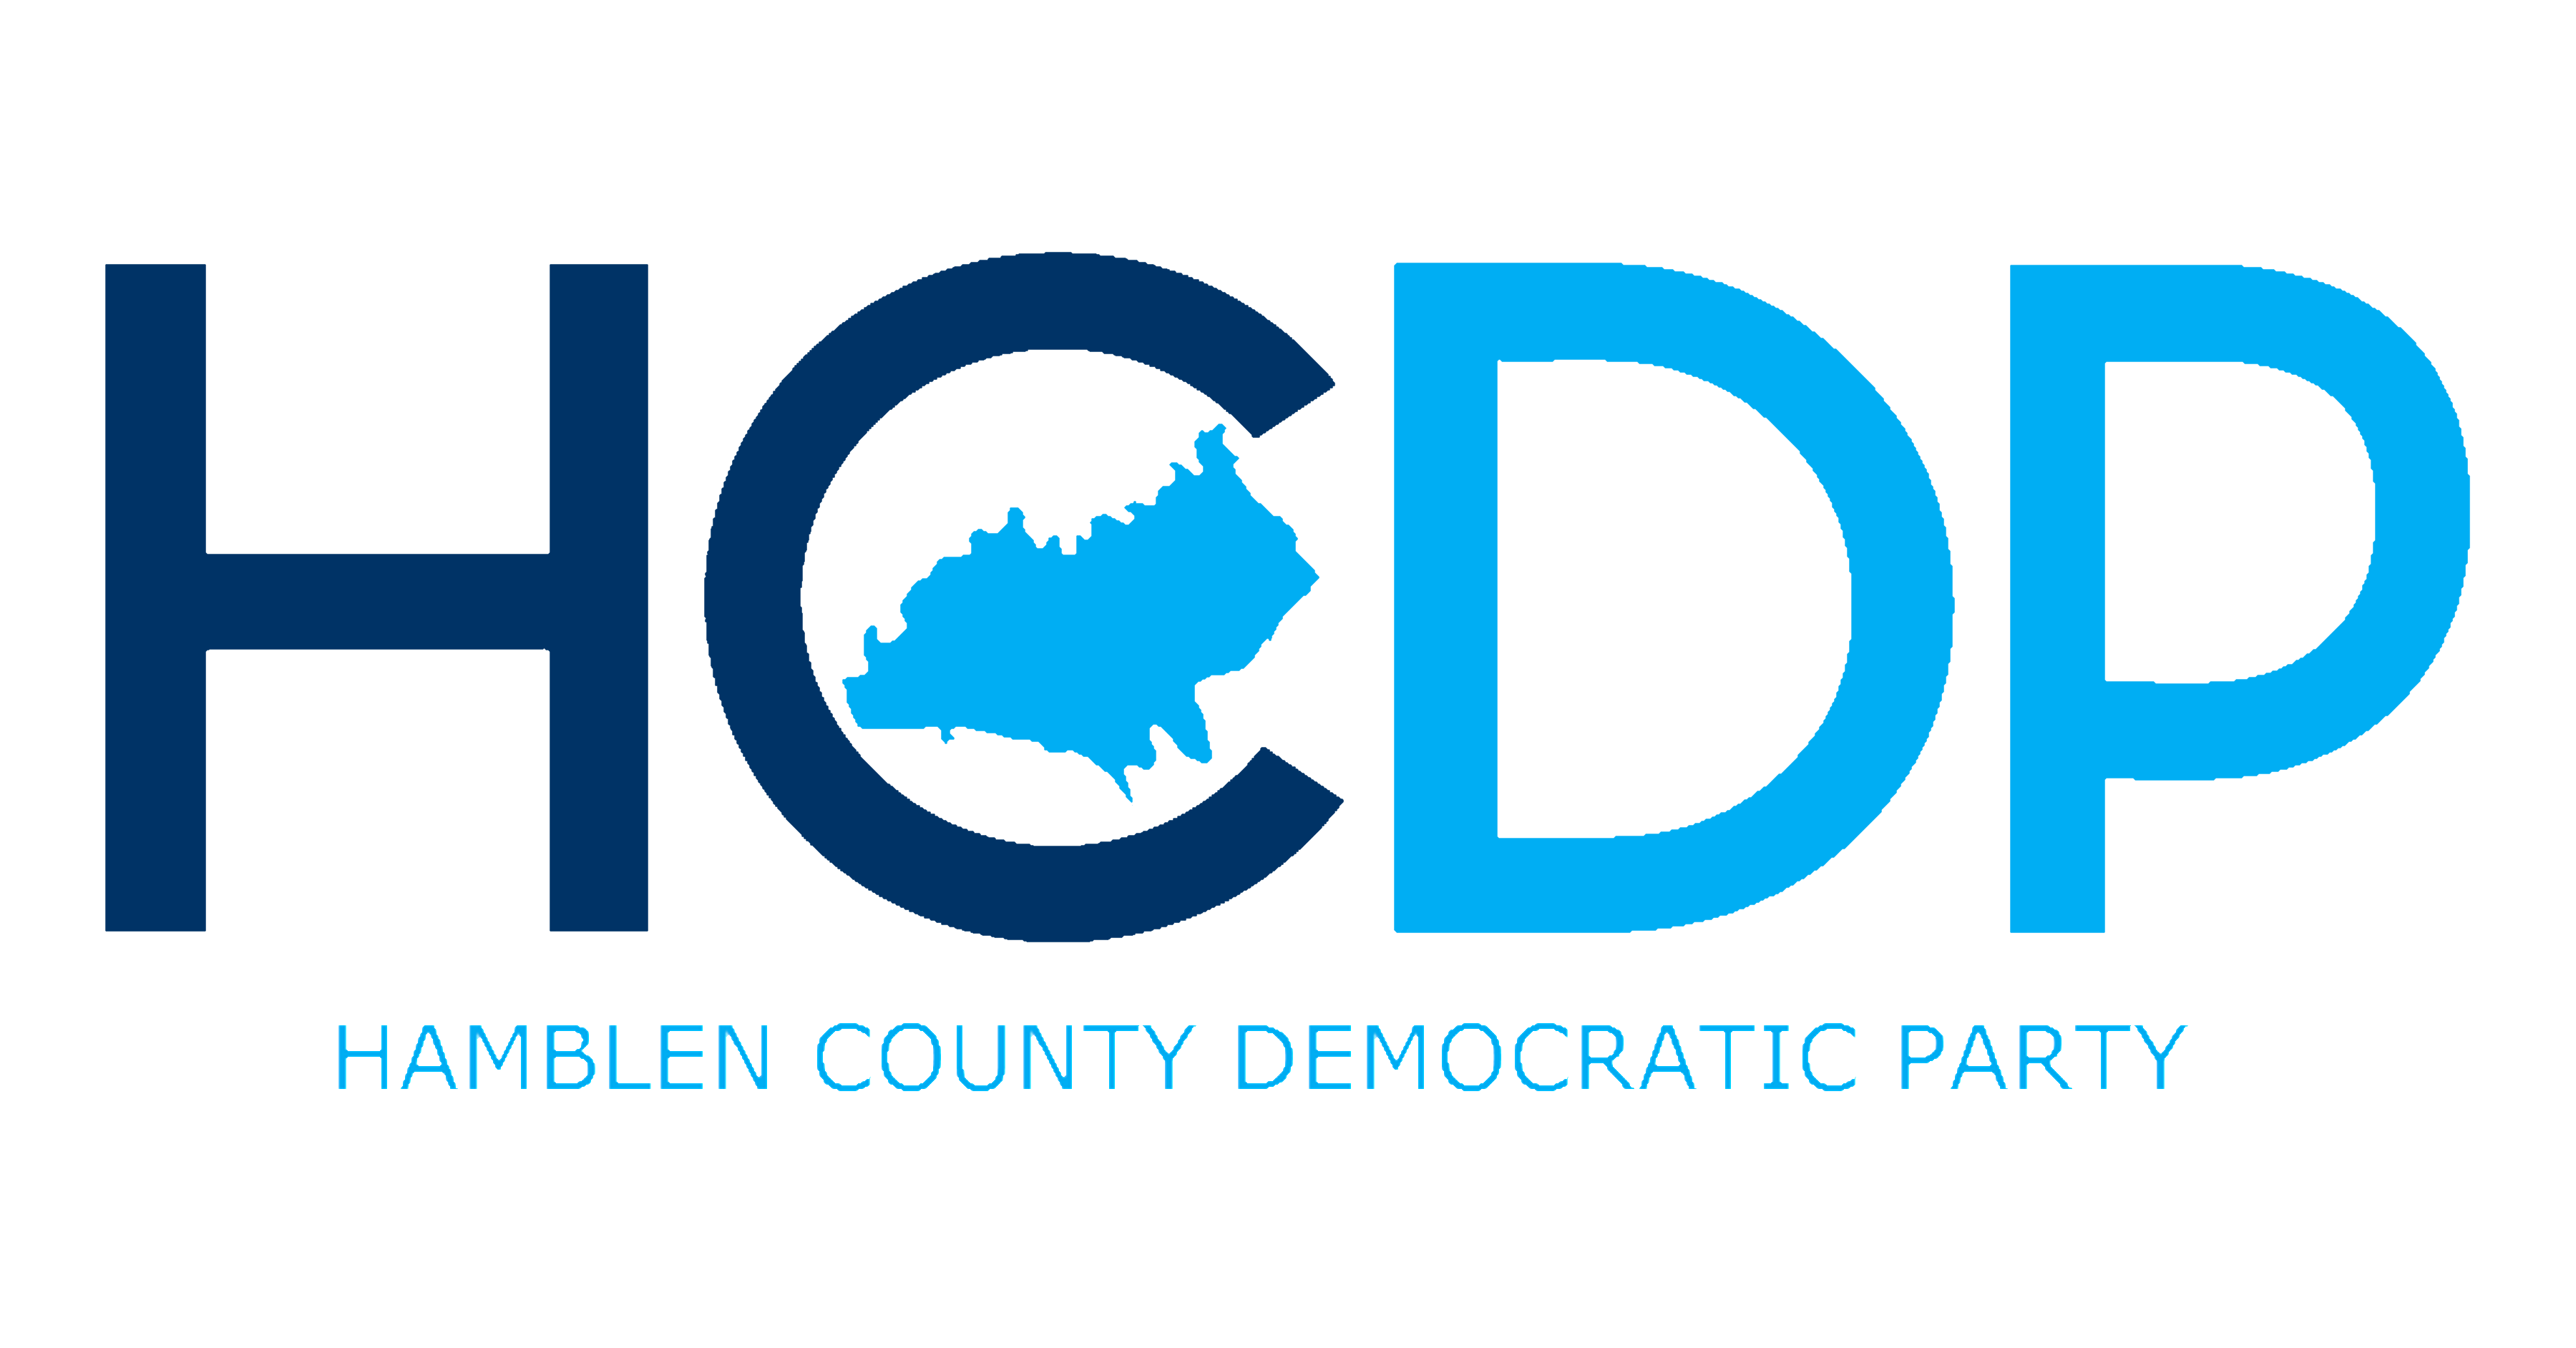 Hamblen County Democratic Party